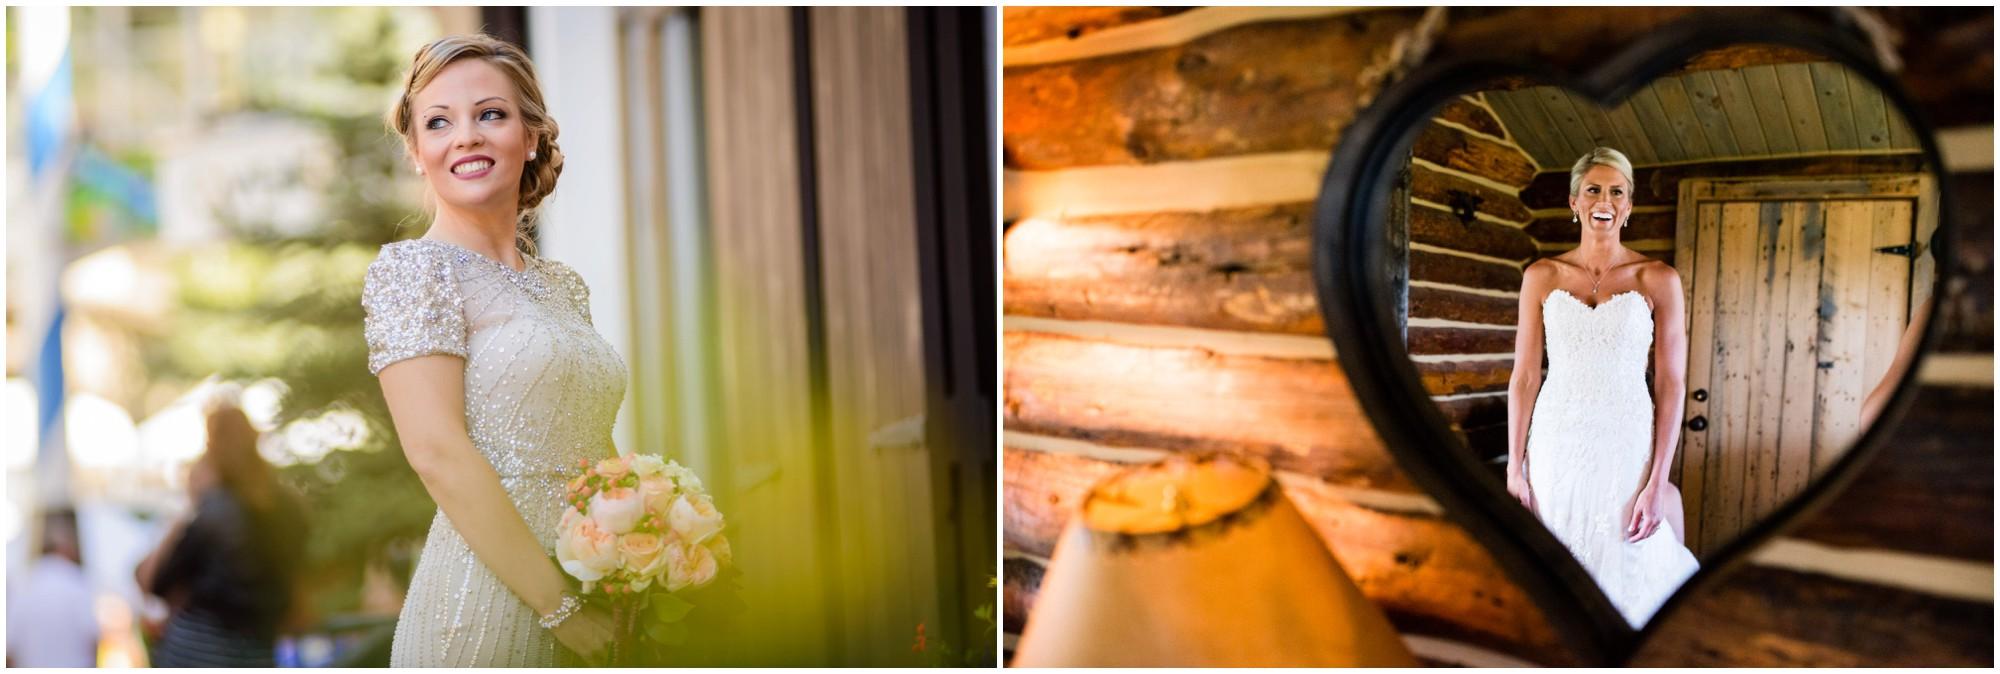 127-Vail-beaver-creek-wedding-photography.jpg